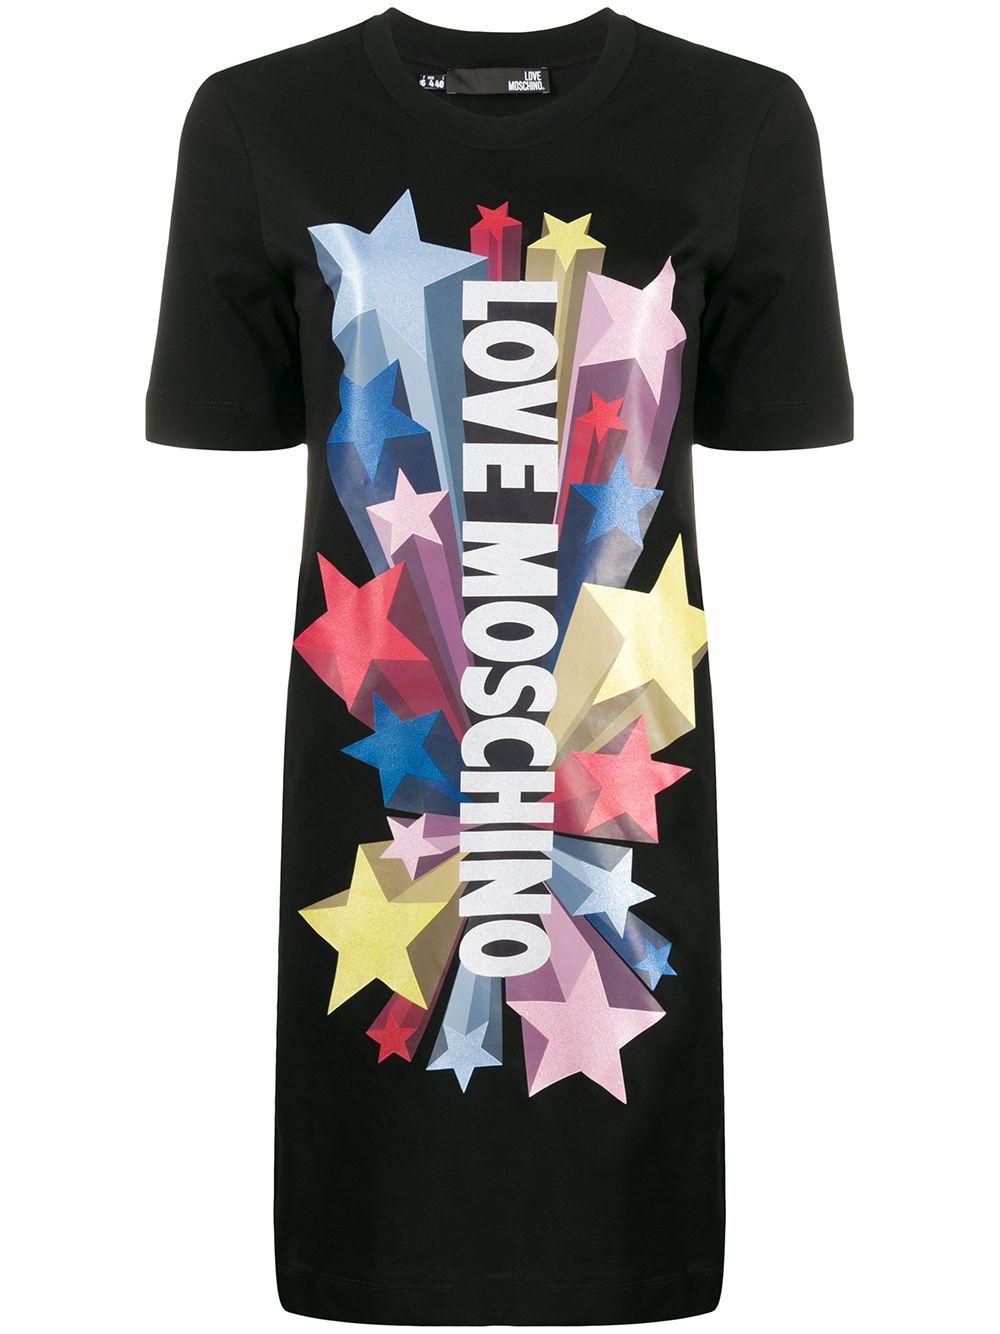 Shooting Stars T Shirt Dress In C74 Black In 2020 T Shirt Dress Black Shirt Dress Moschino